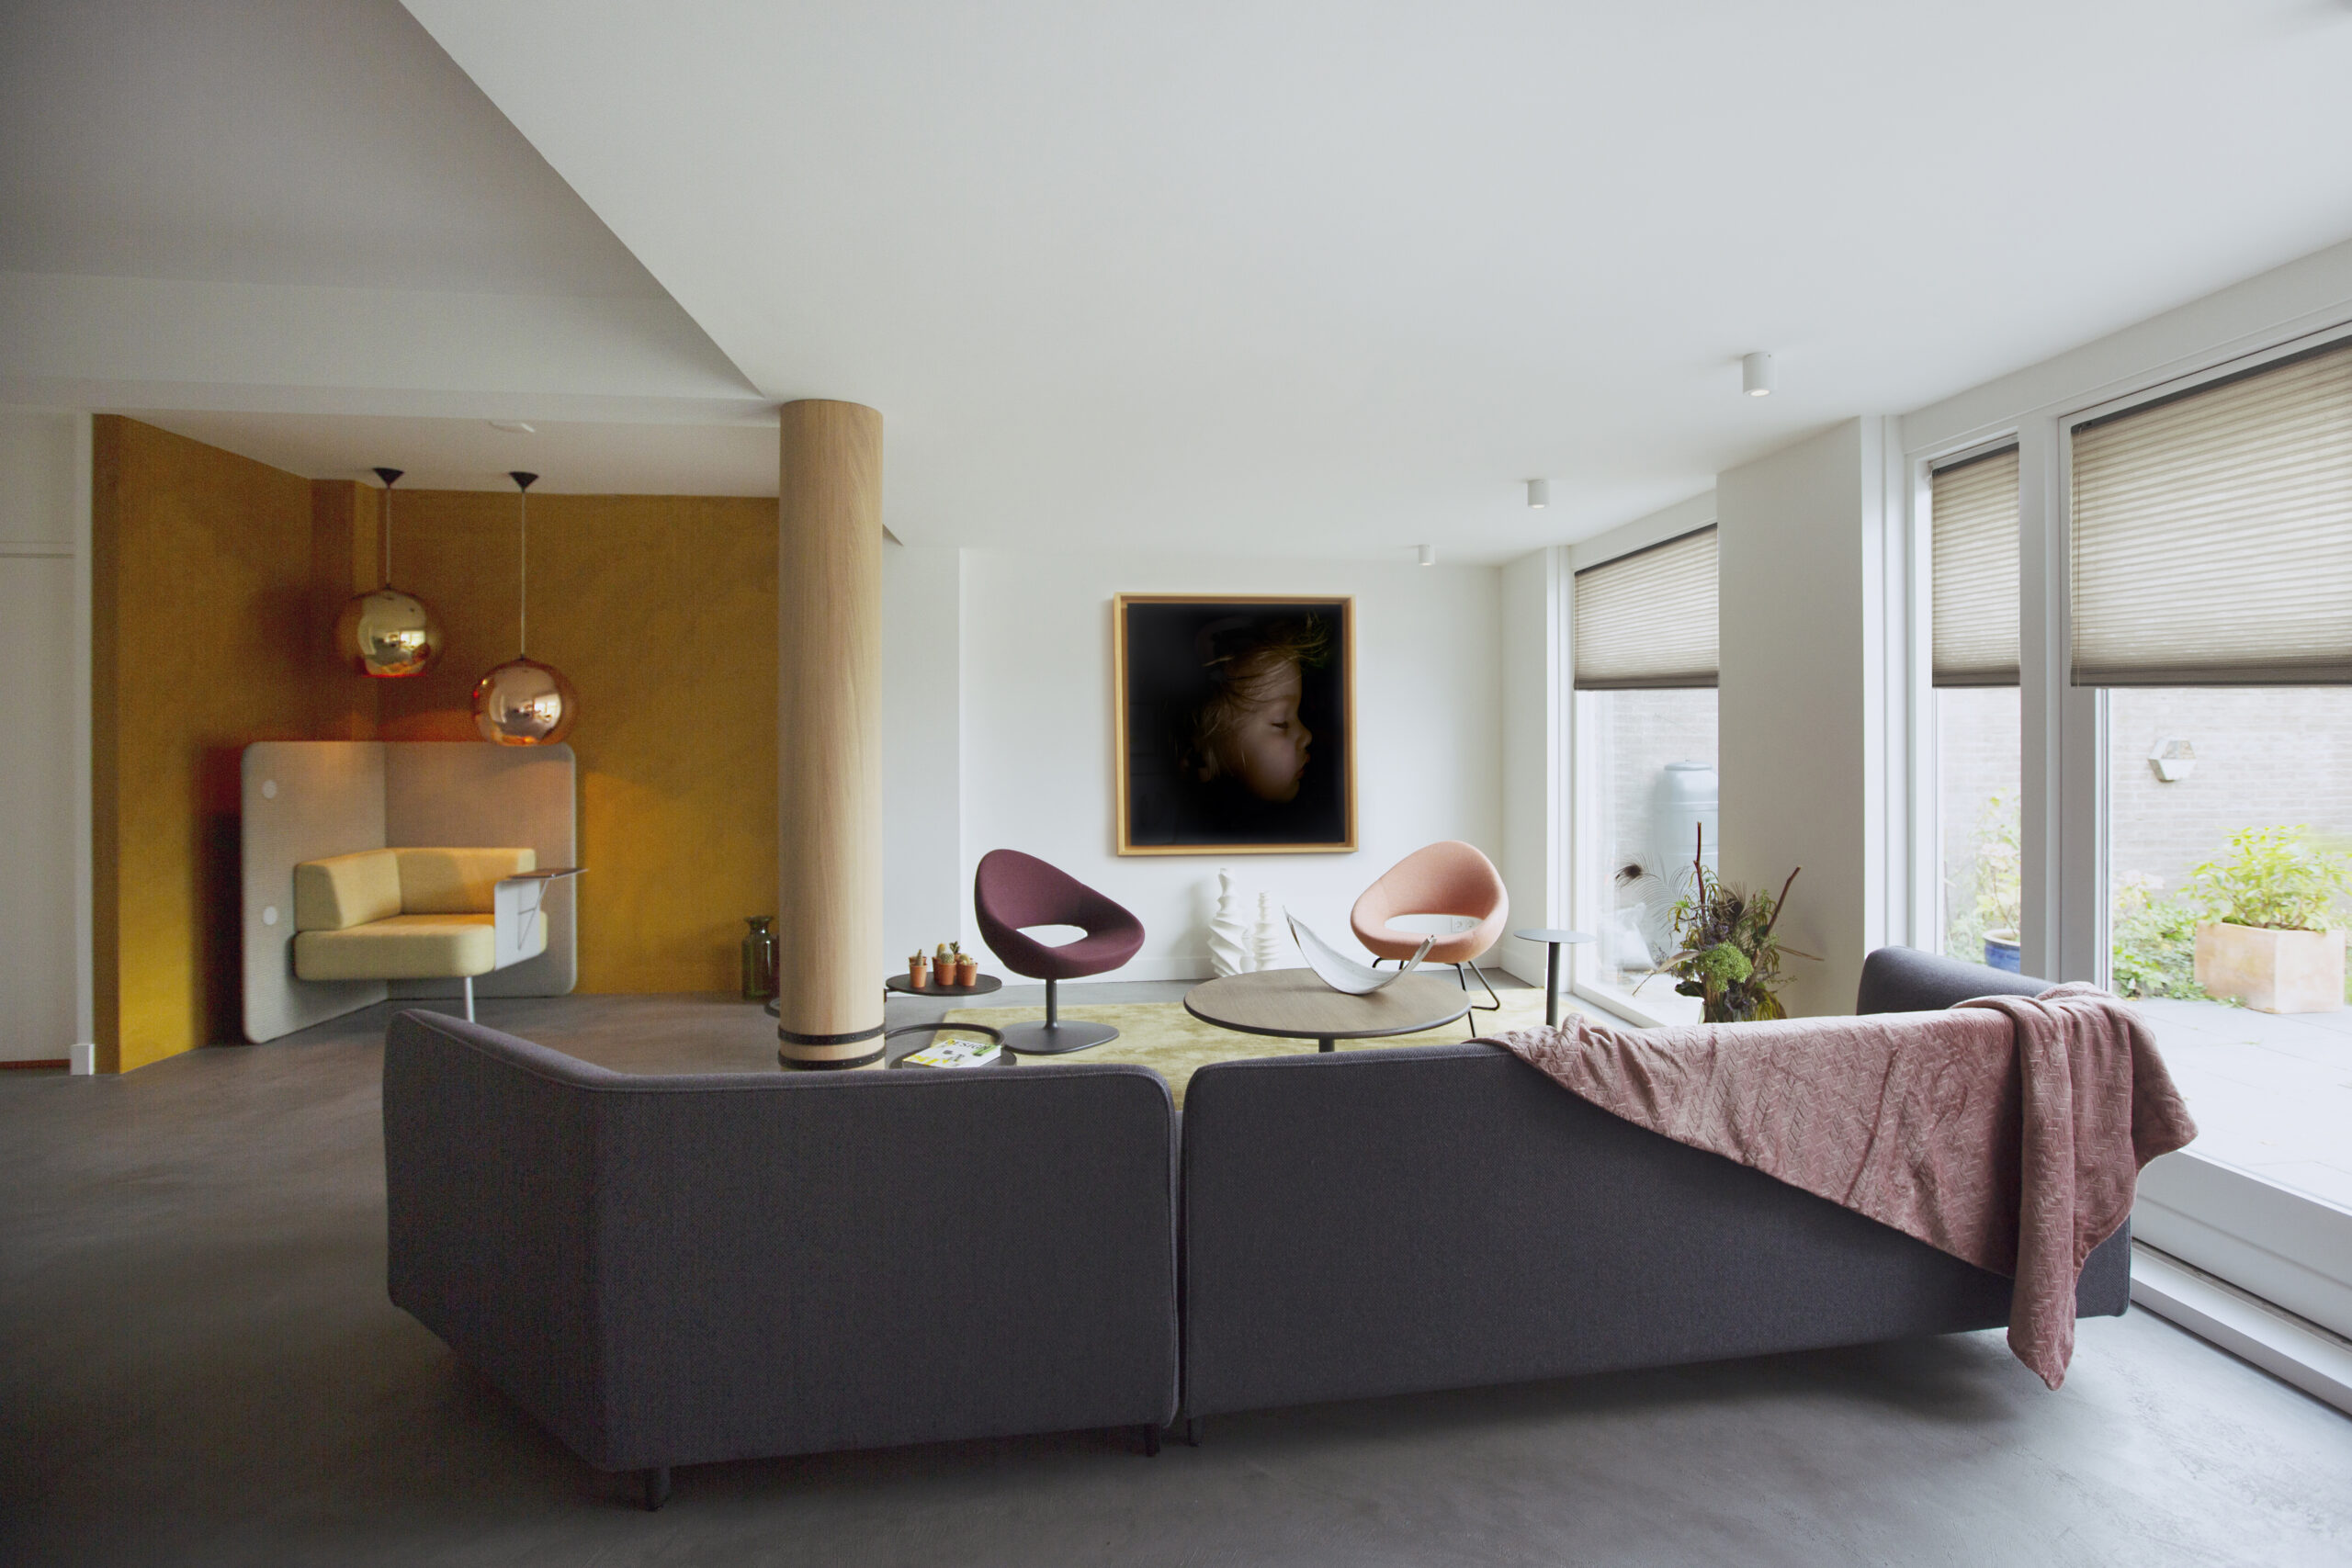 interieurarchitect amsterdam